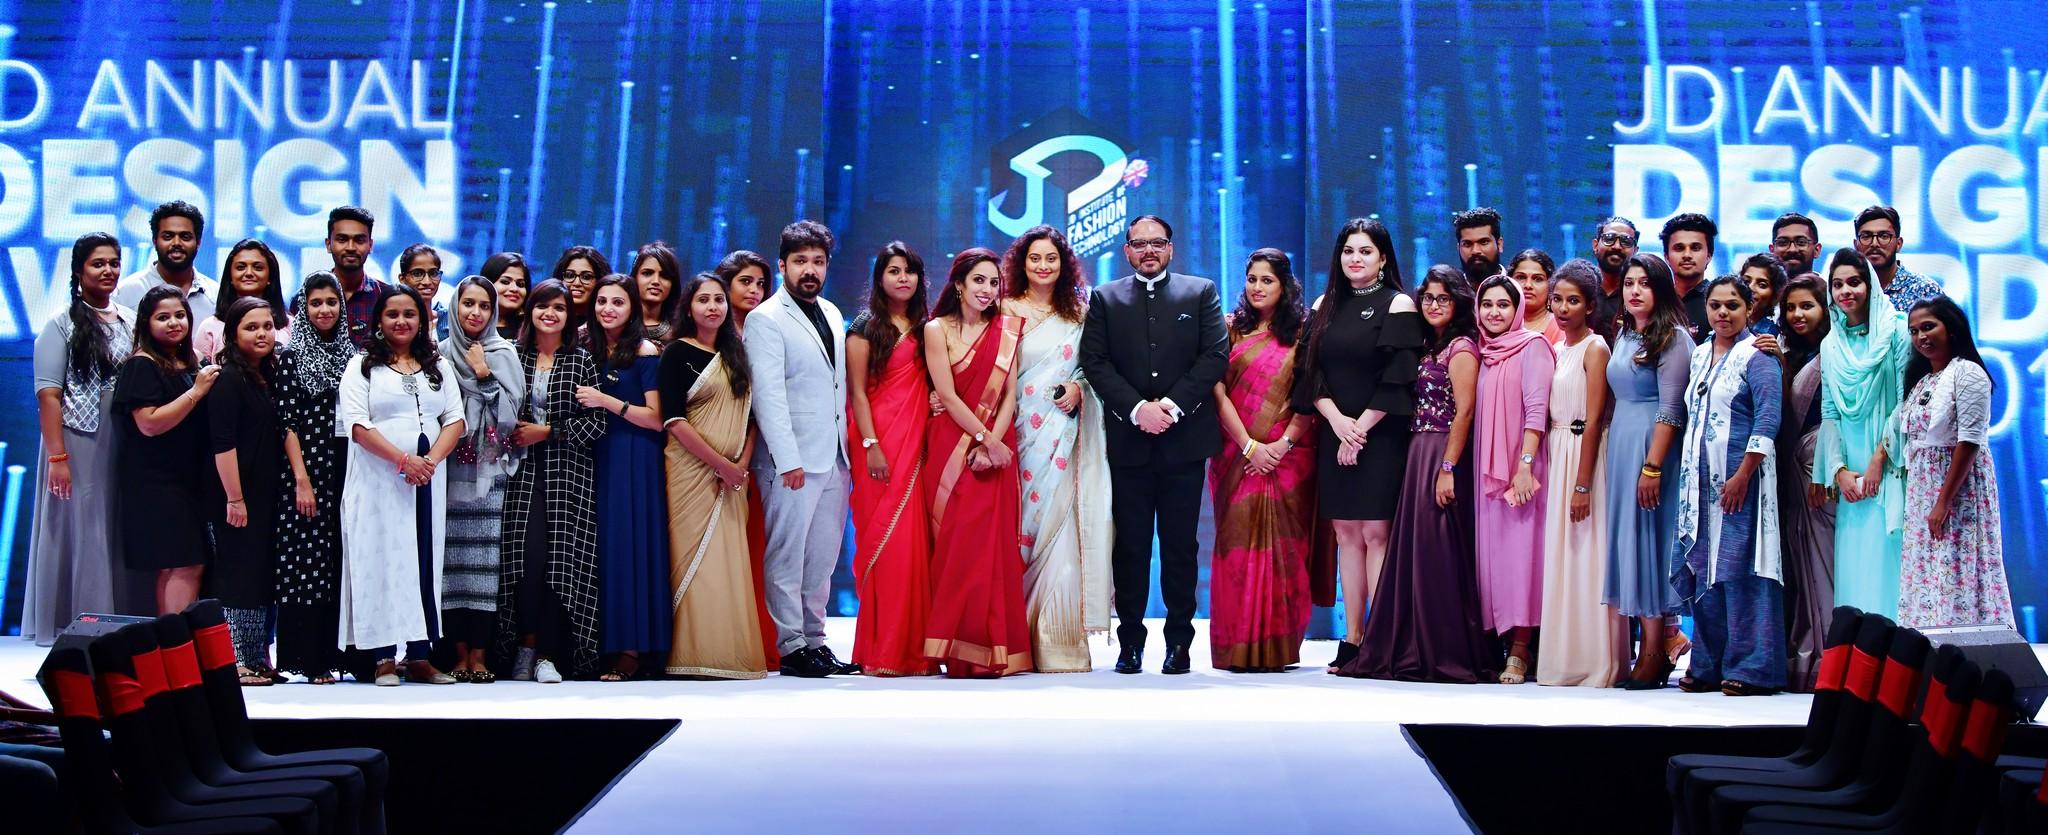 Celebration of Change in Design: JDADA 2018 Kochi celebration of change in design - Cochin 2 - Celebration of Change in Design: JDADA 2018 Kochi